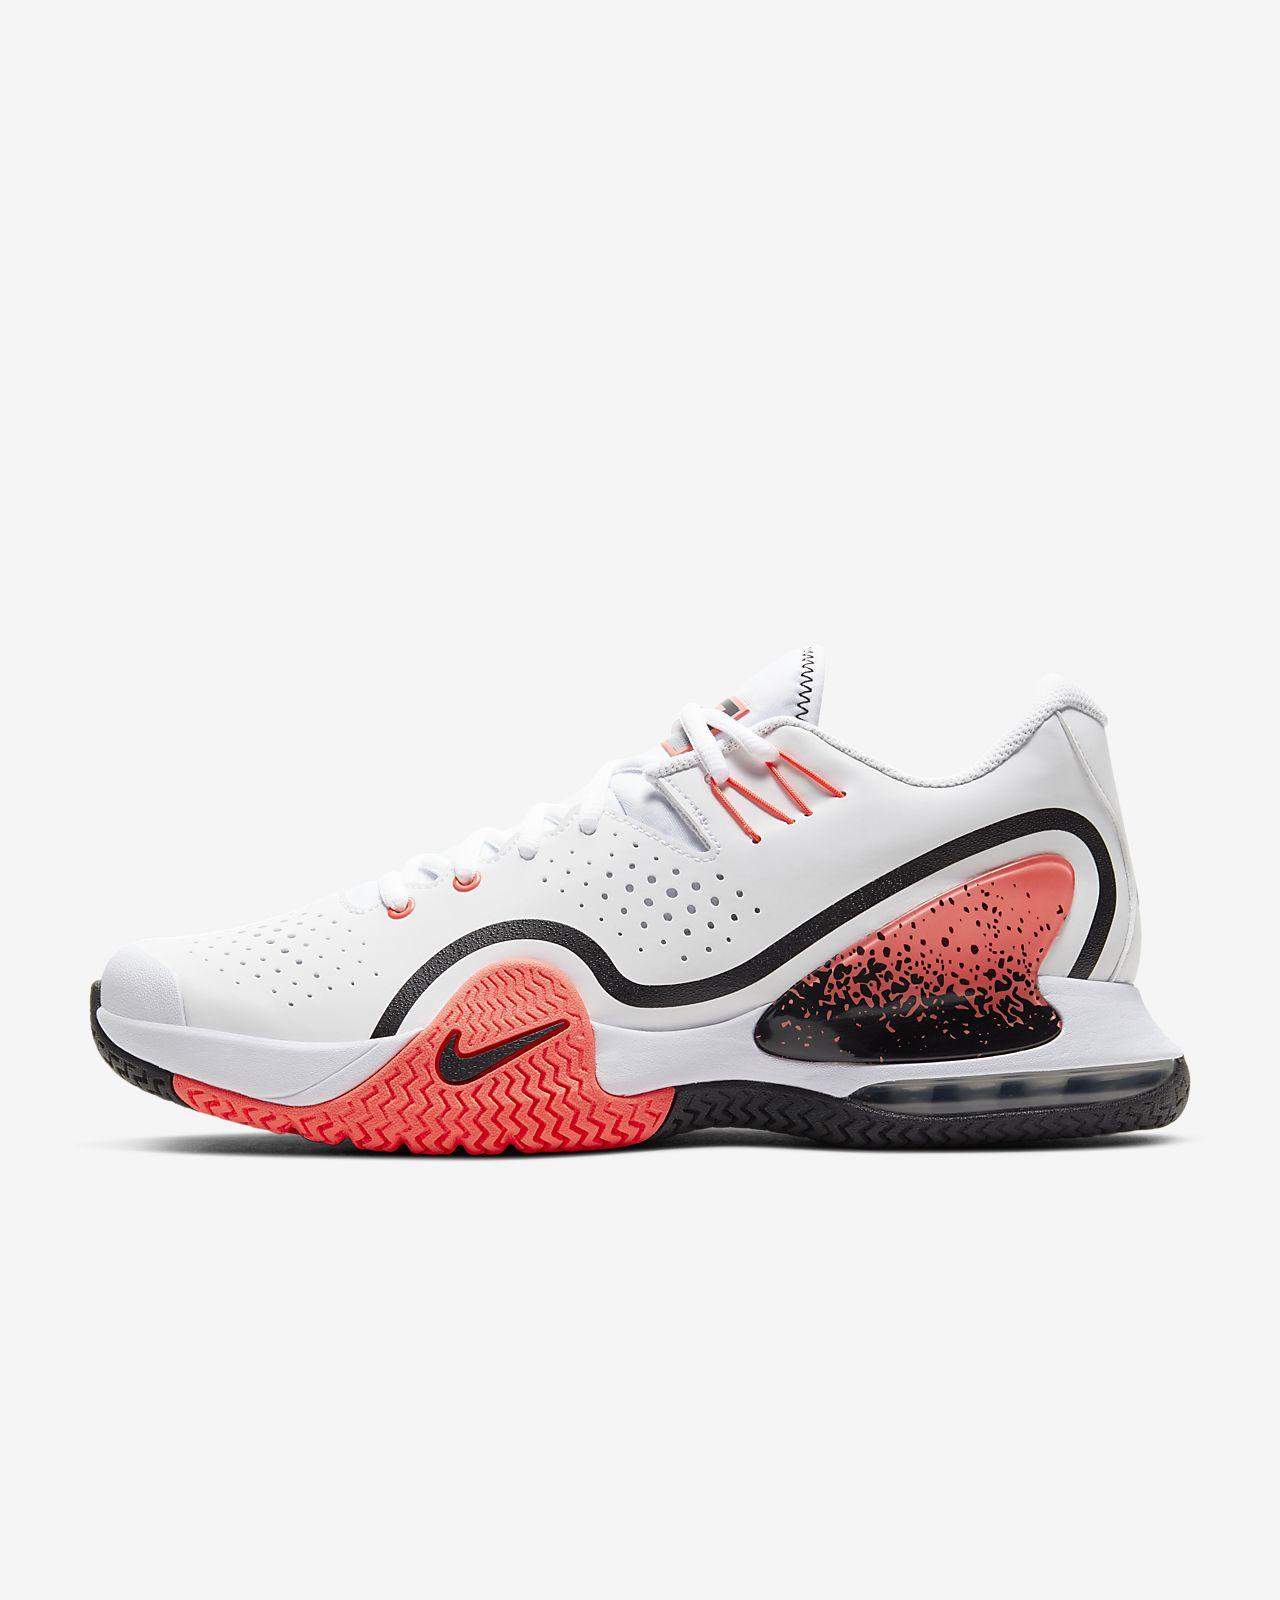 calidad autentica el mejor valor fabuloso Nike SB Challenge Court | Nike skateboarding, Nike sb, Nike